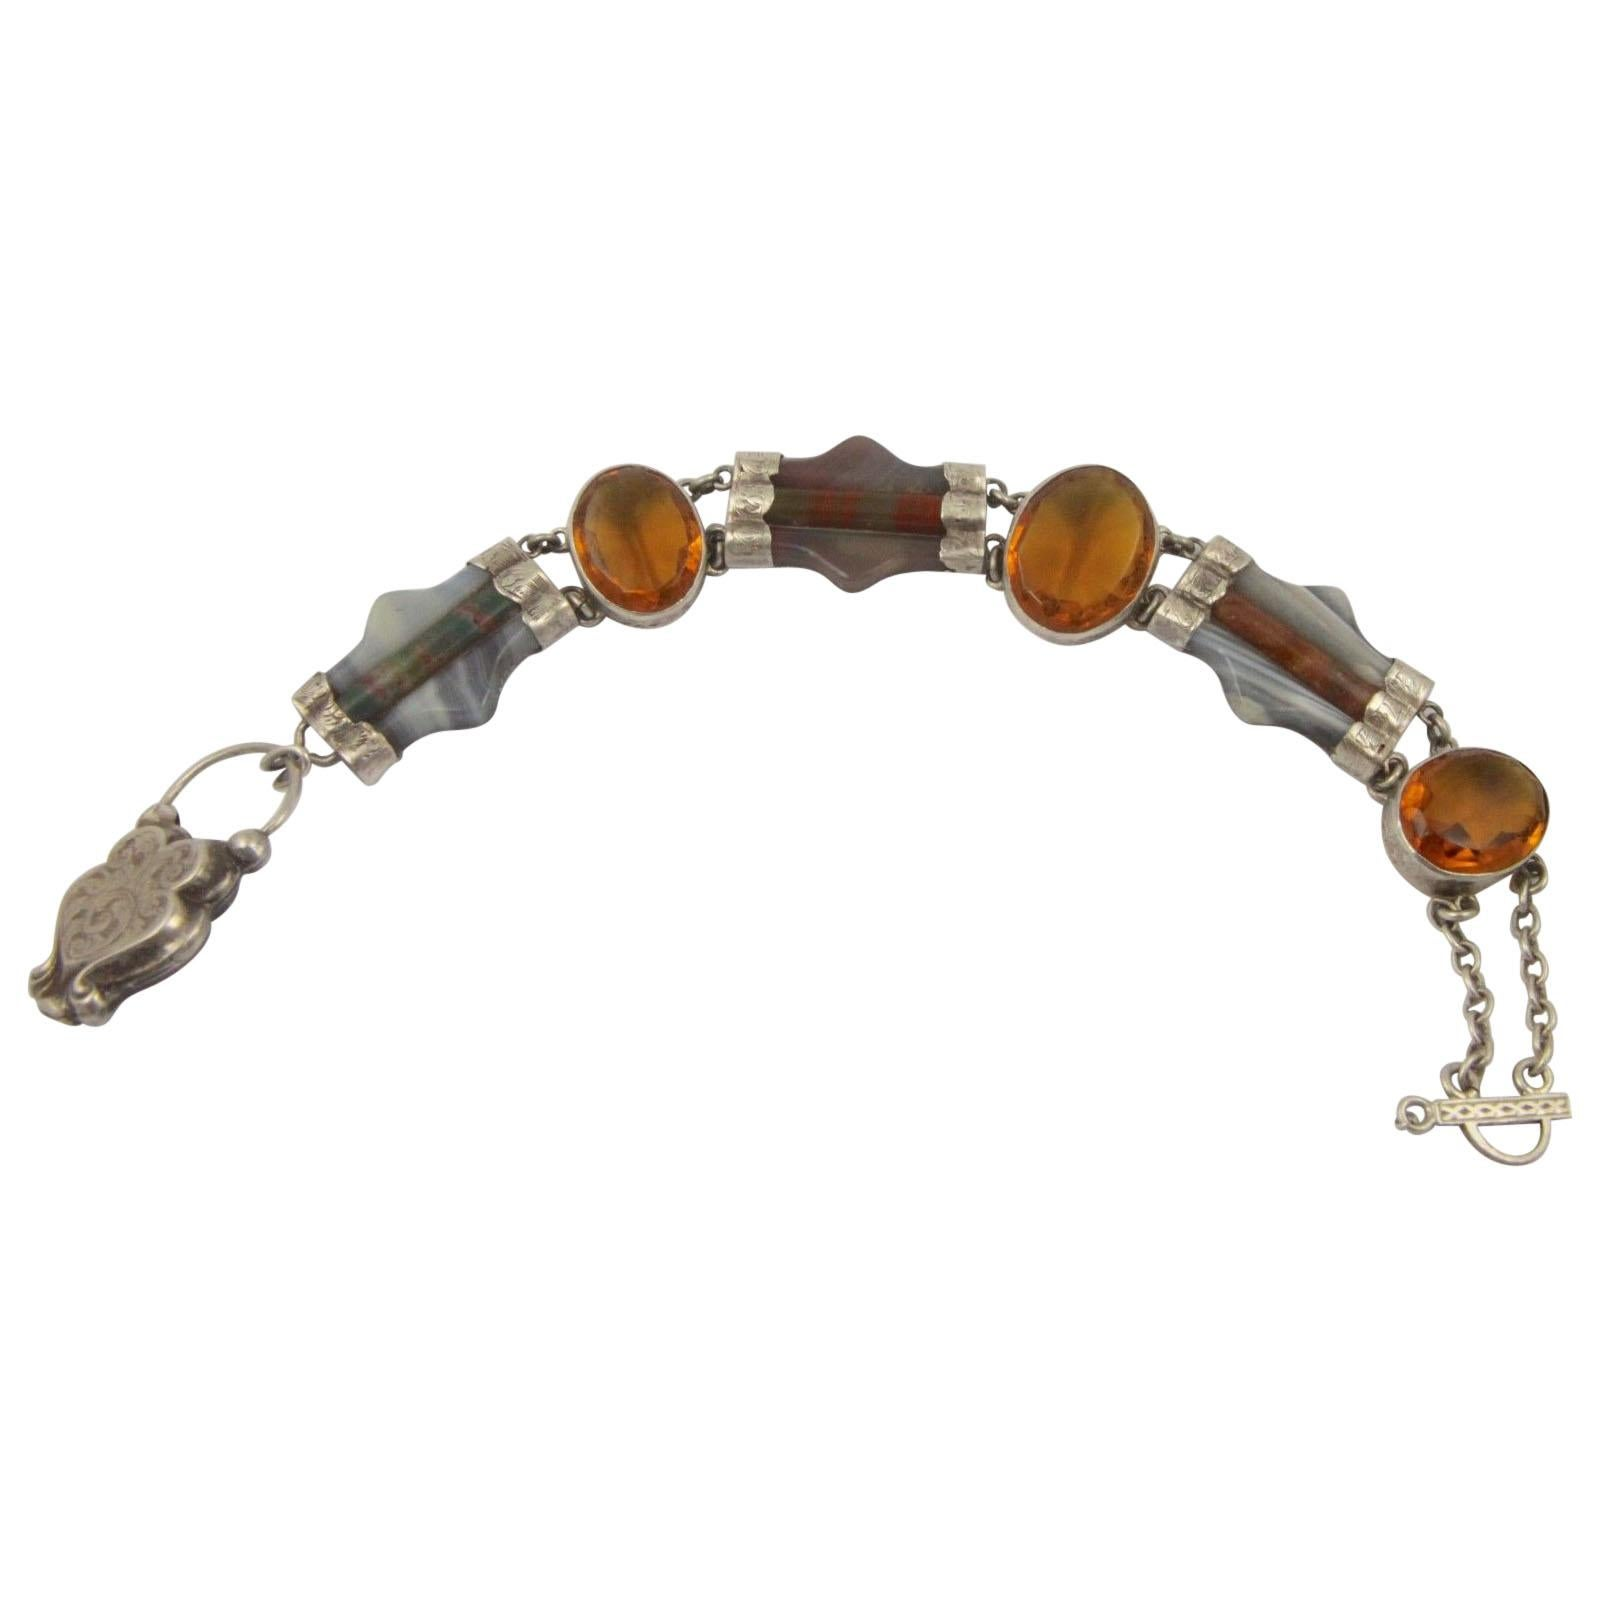 Vintage Silver Scottish  Bracelet Bangle Very Unusual